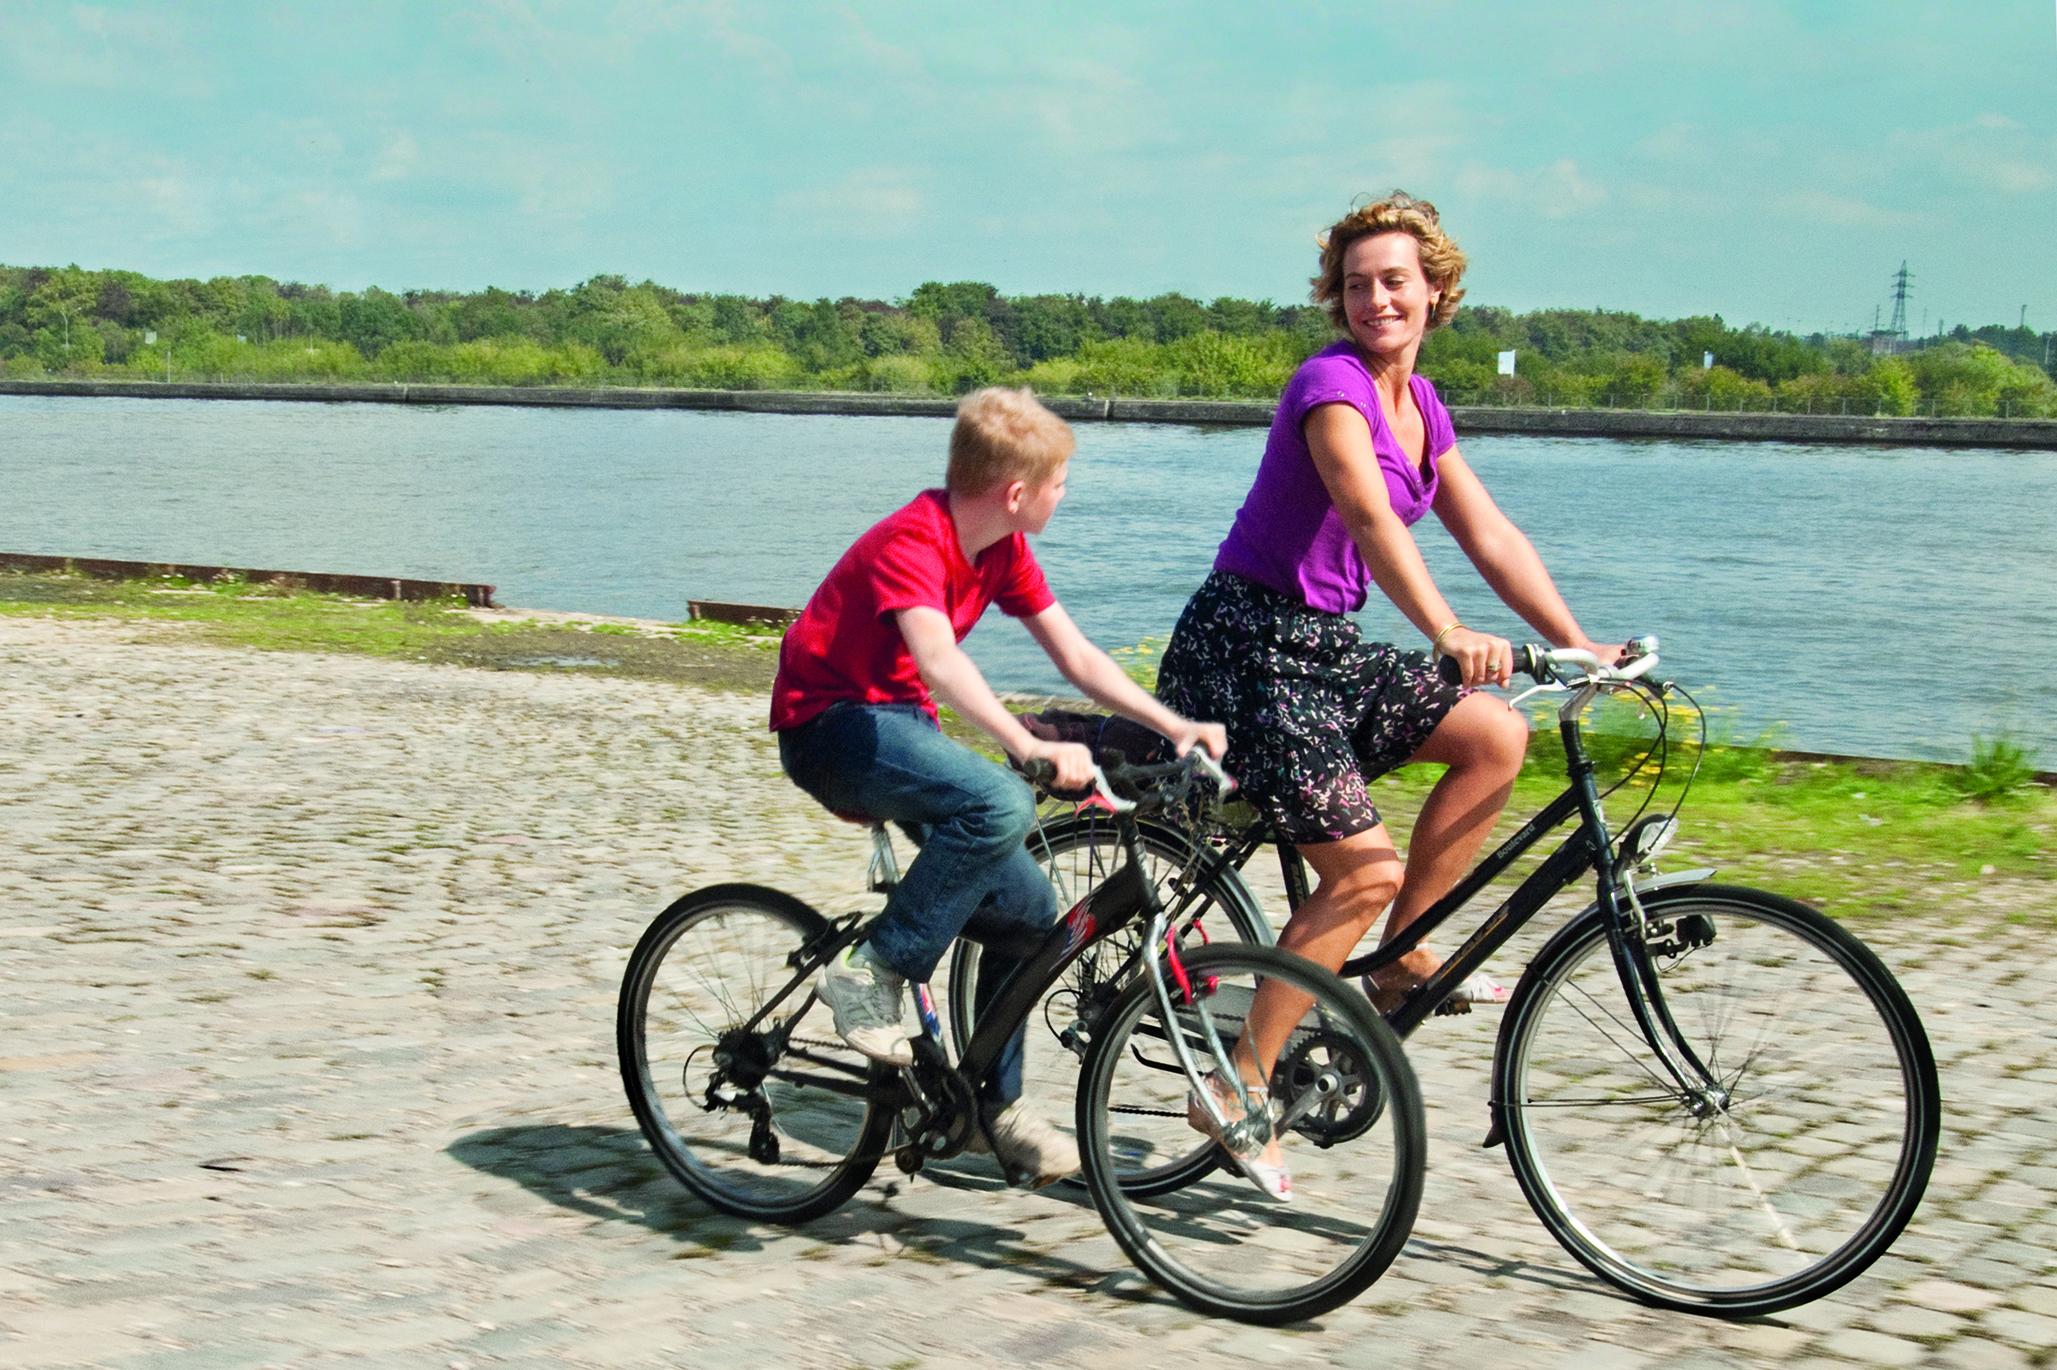 29 El niño de la bicicleta